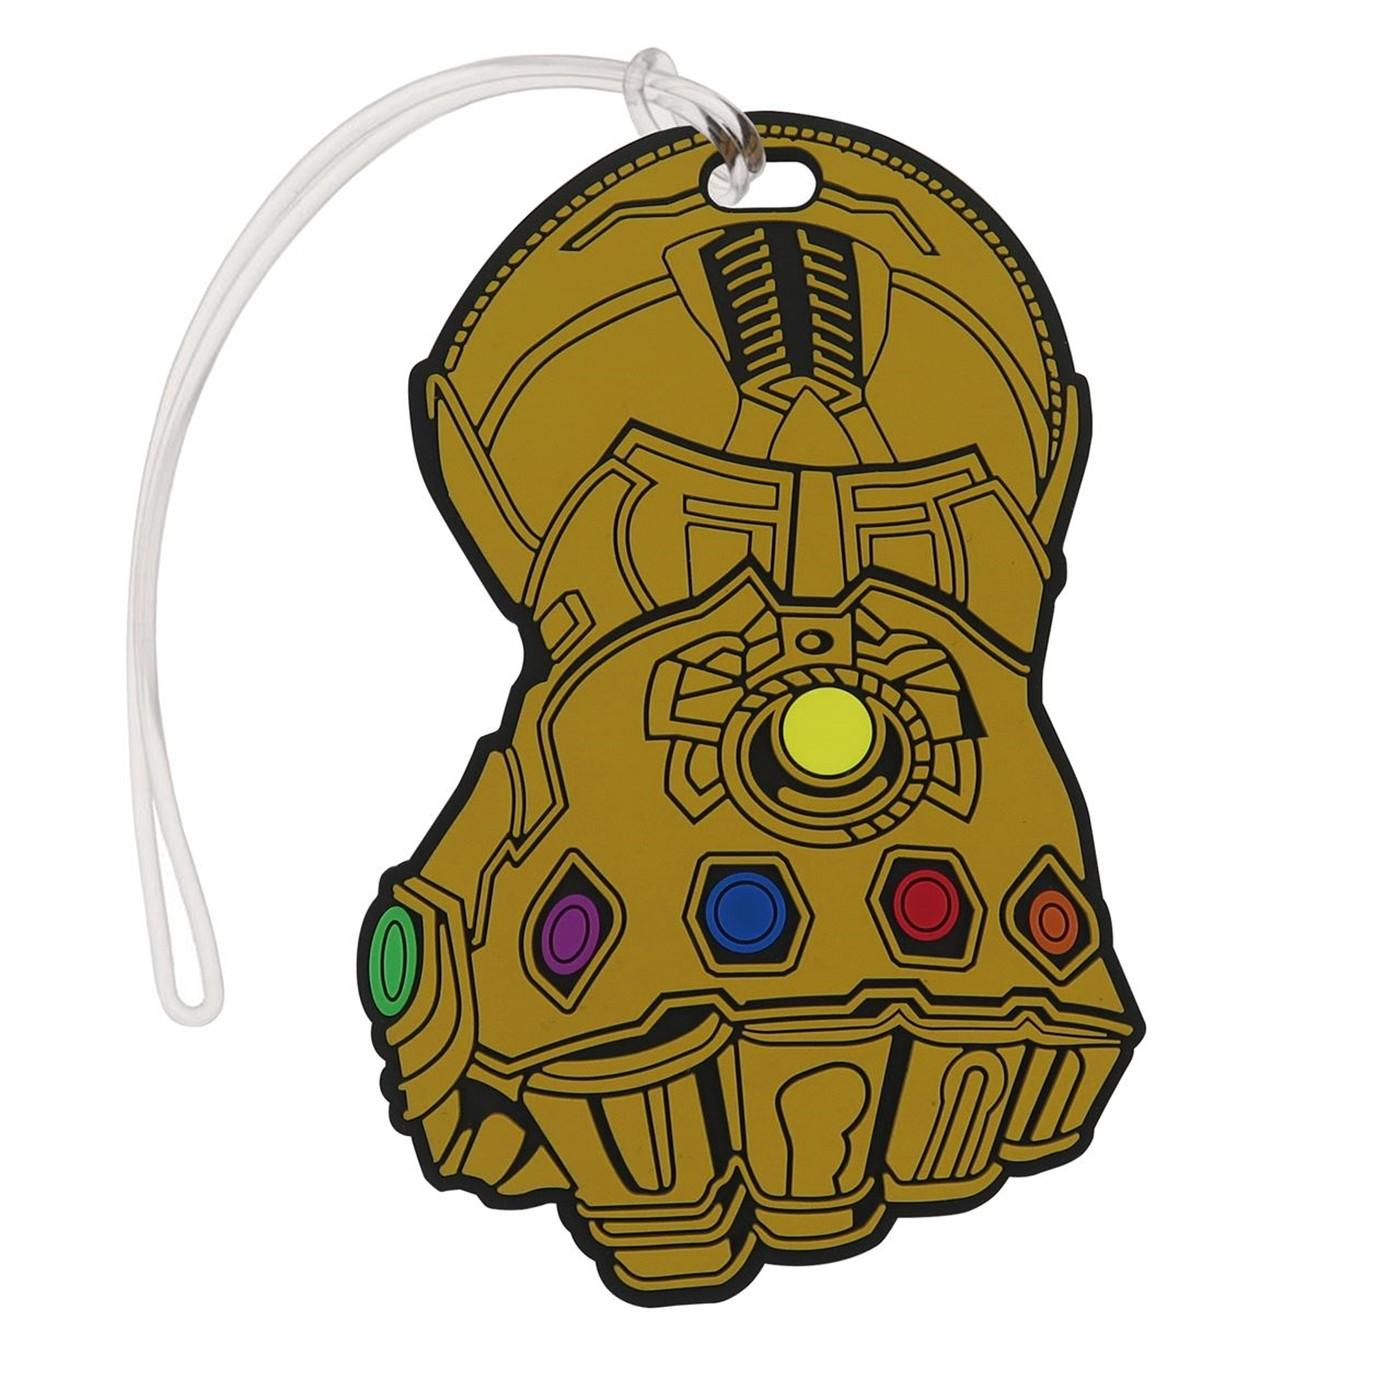 Infinity War Thanos Infinity Gauntlet Luggage Tag